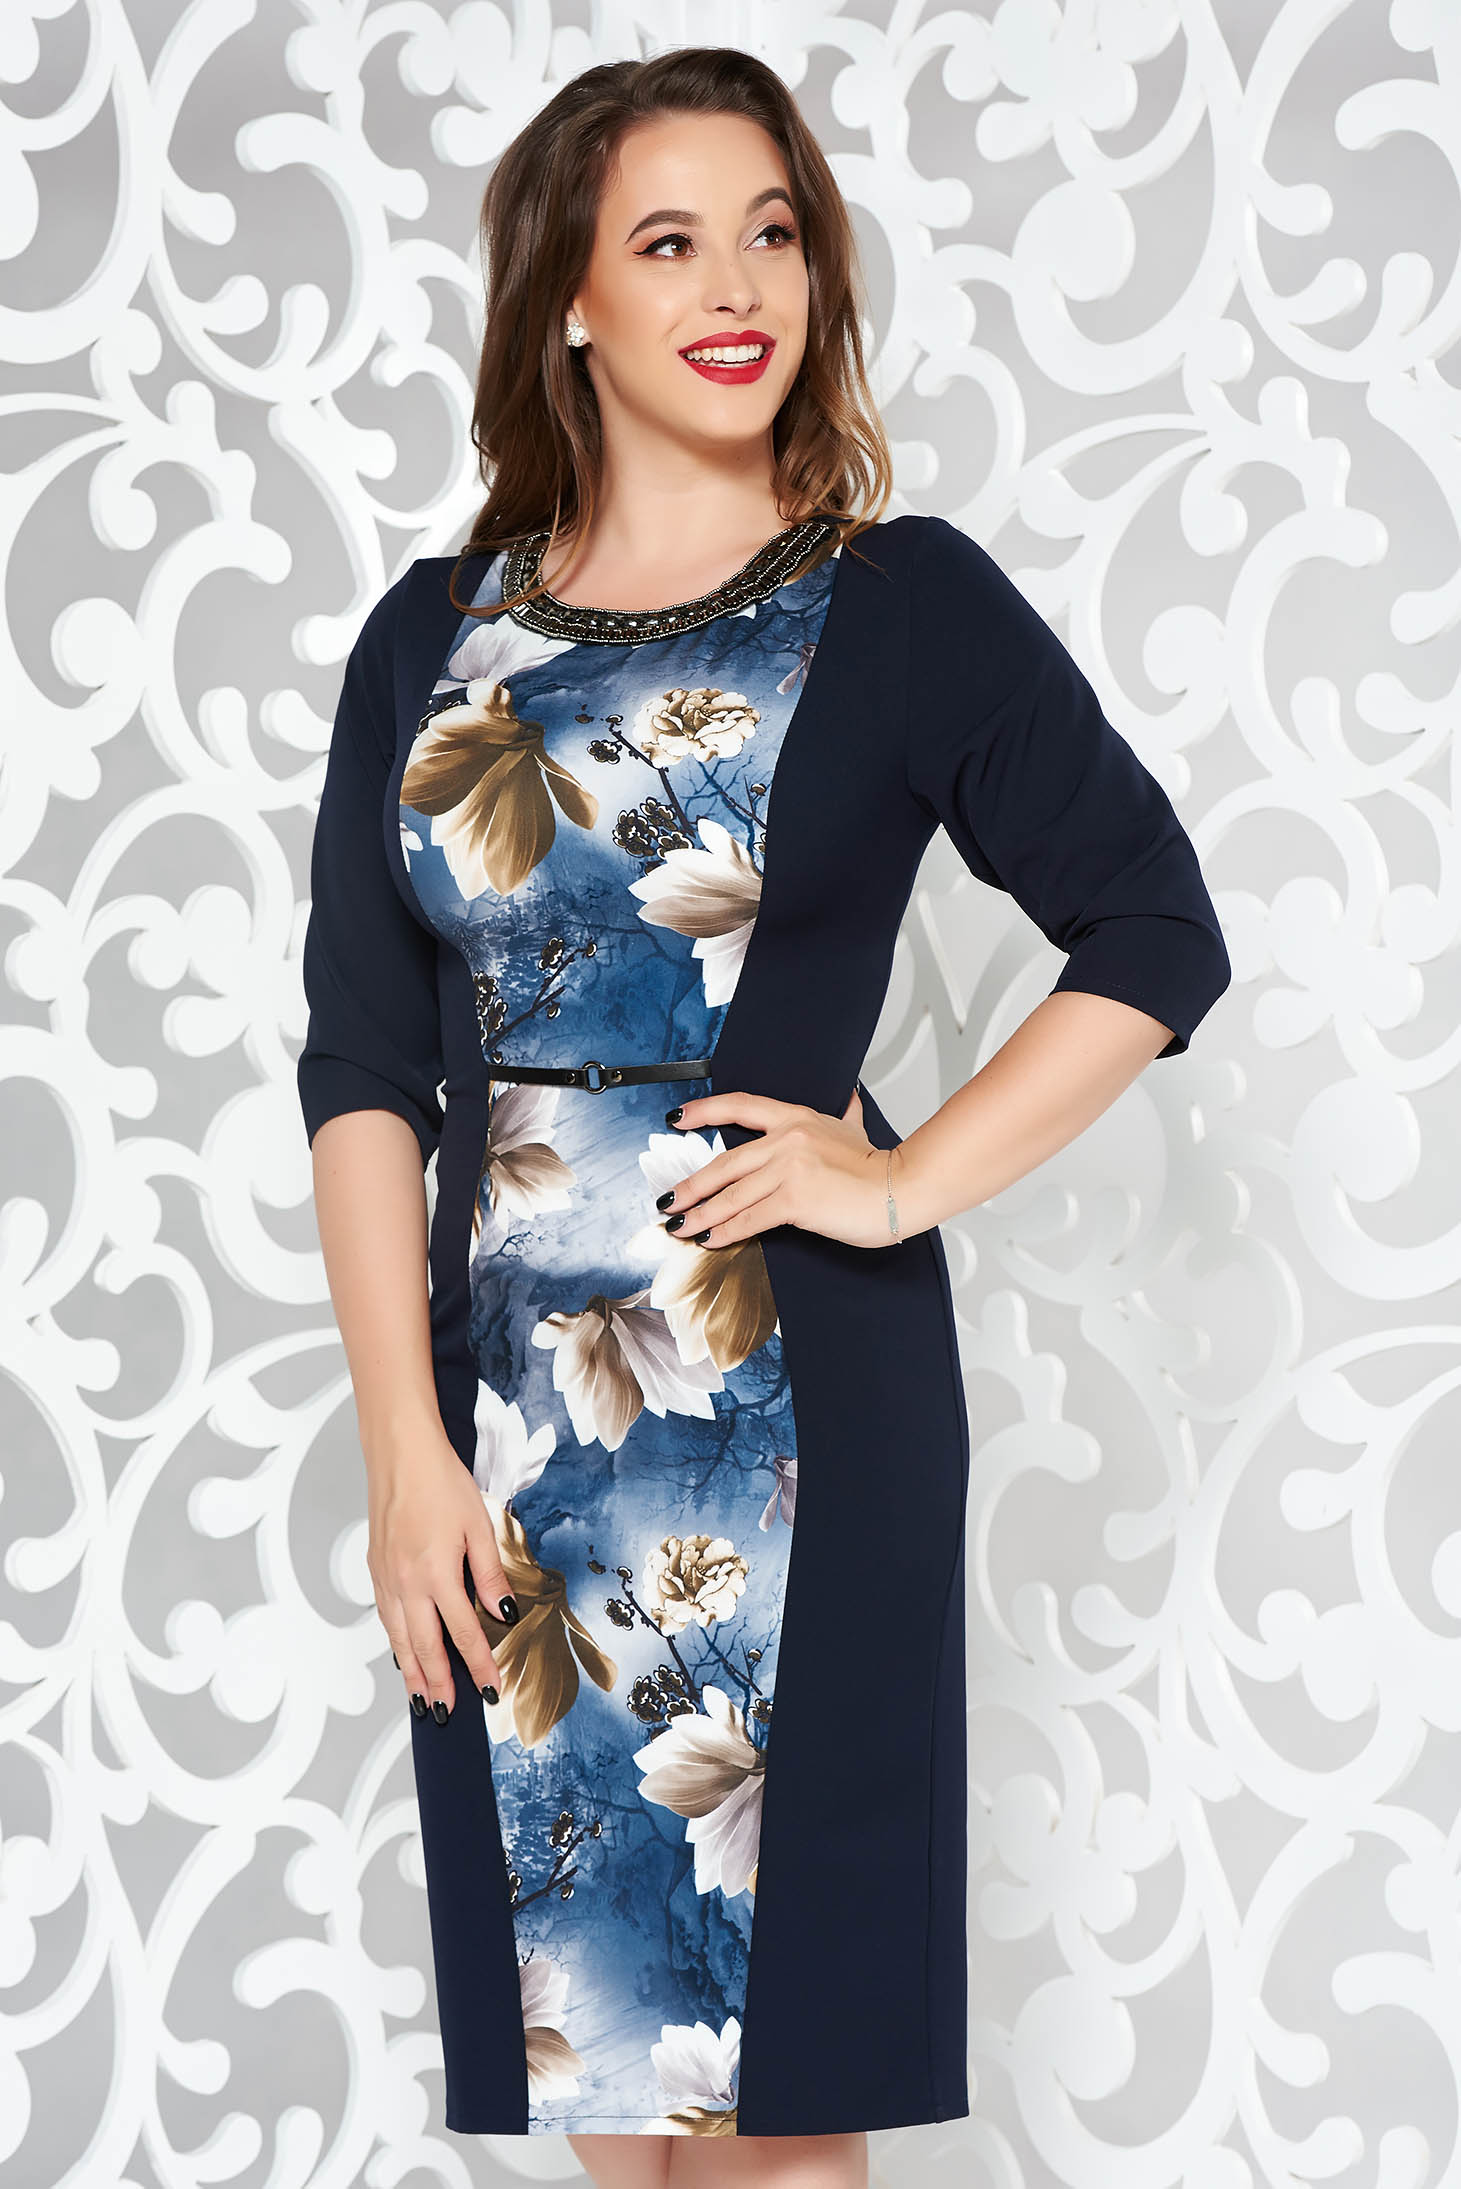 Rochie albastru-inchis eleganta midi tip creion din stofa usor elastica cu aplicatii cu margele